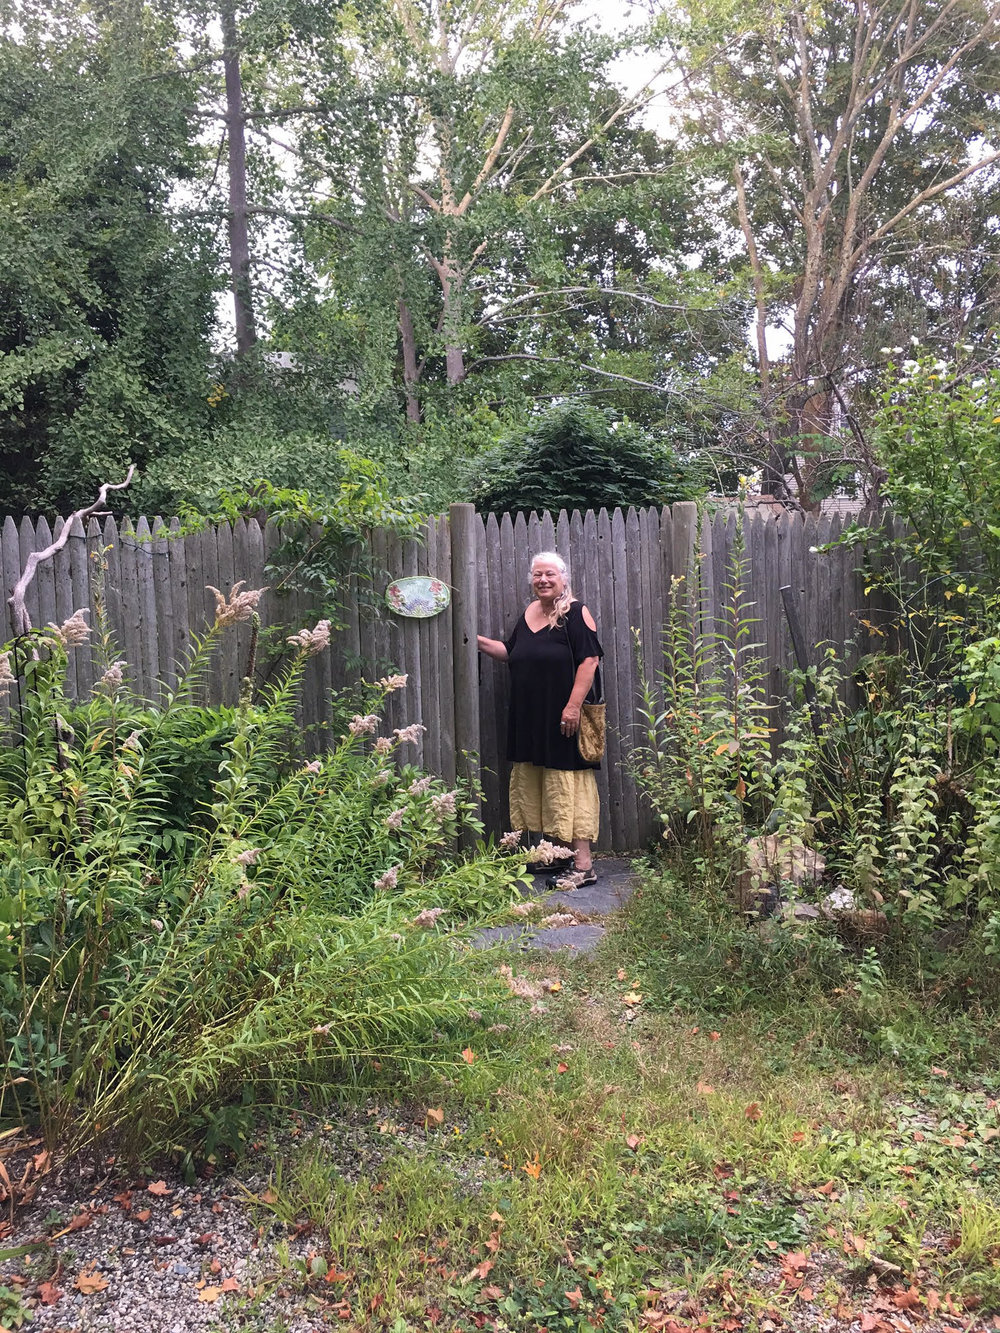 Herbalist Margi Flint stepping into her garden of medicine and beauty.